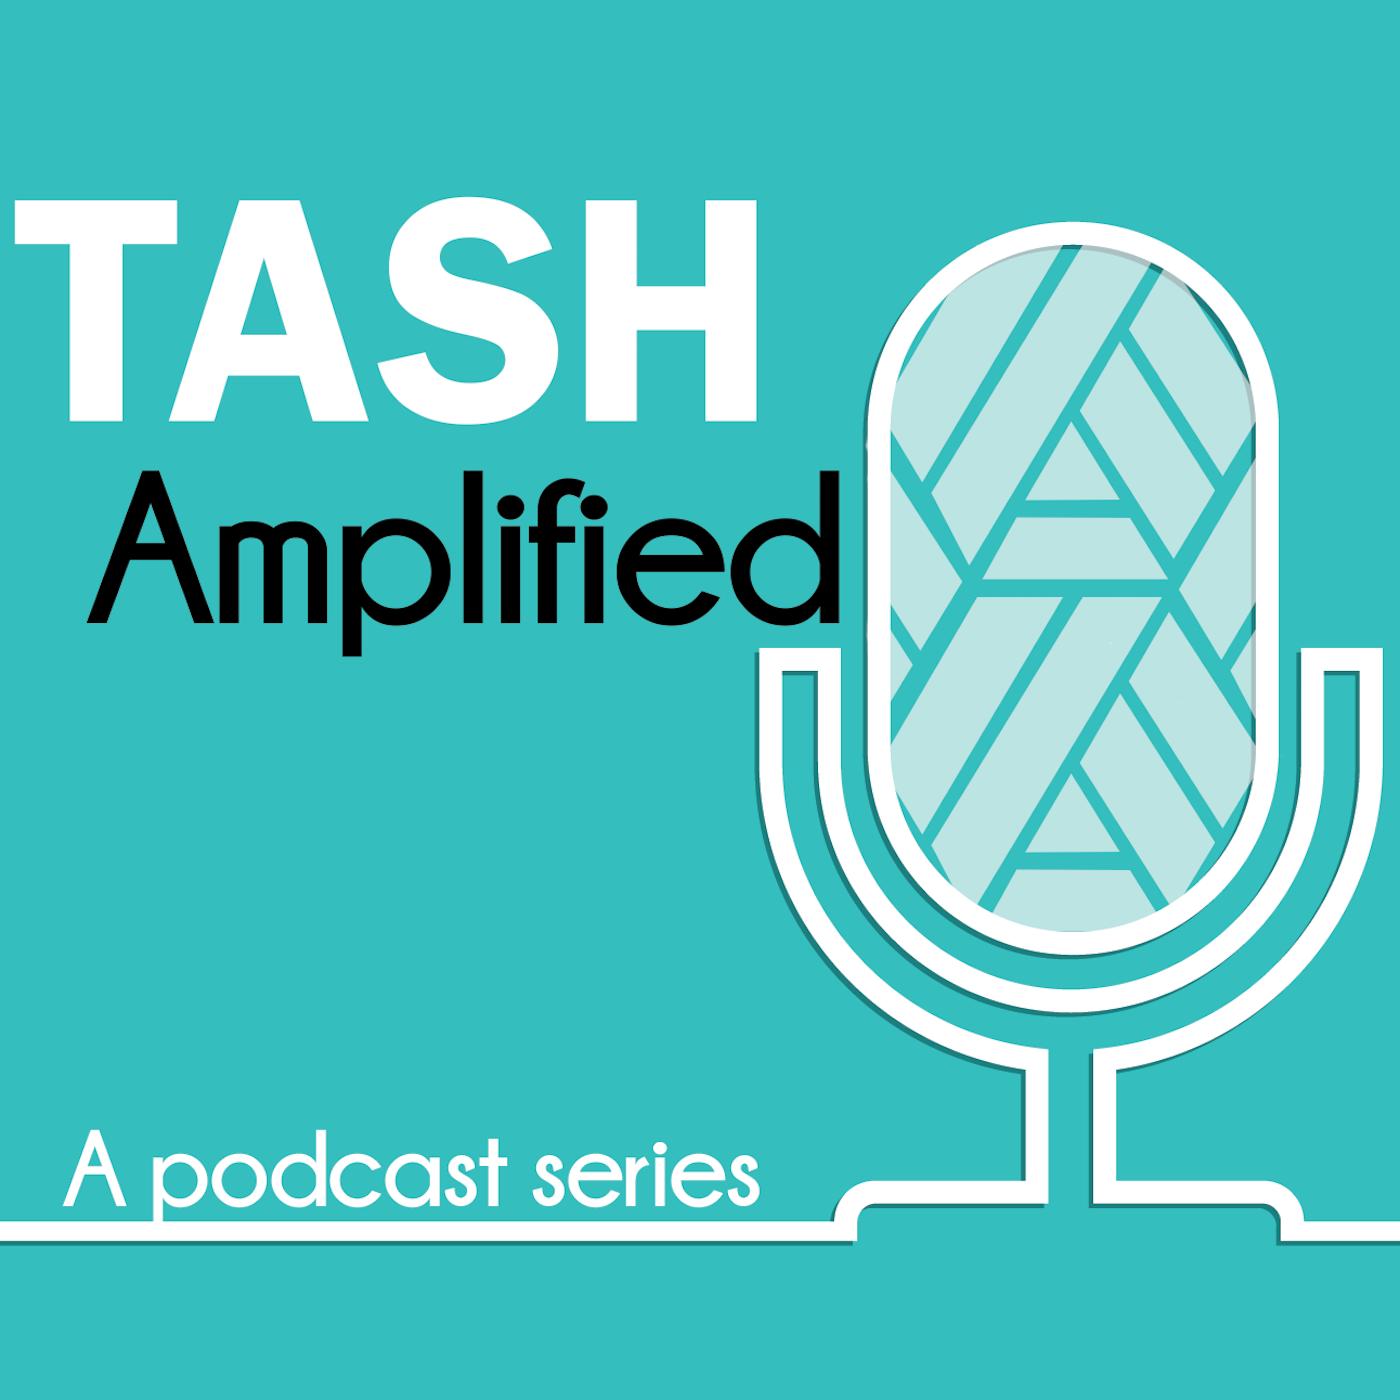 TASH Amplified